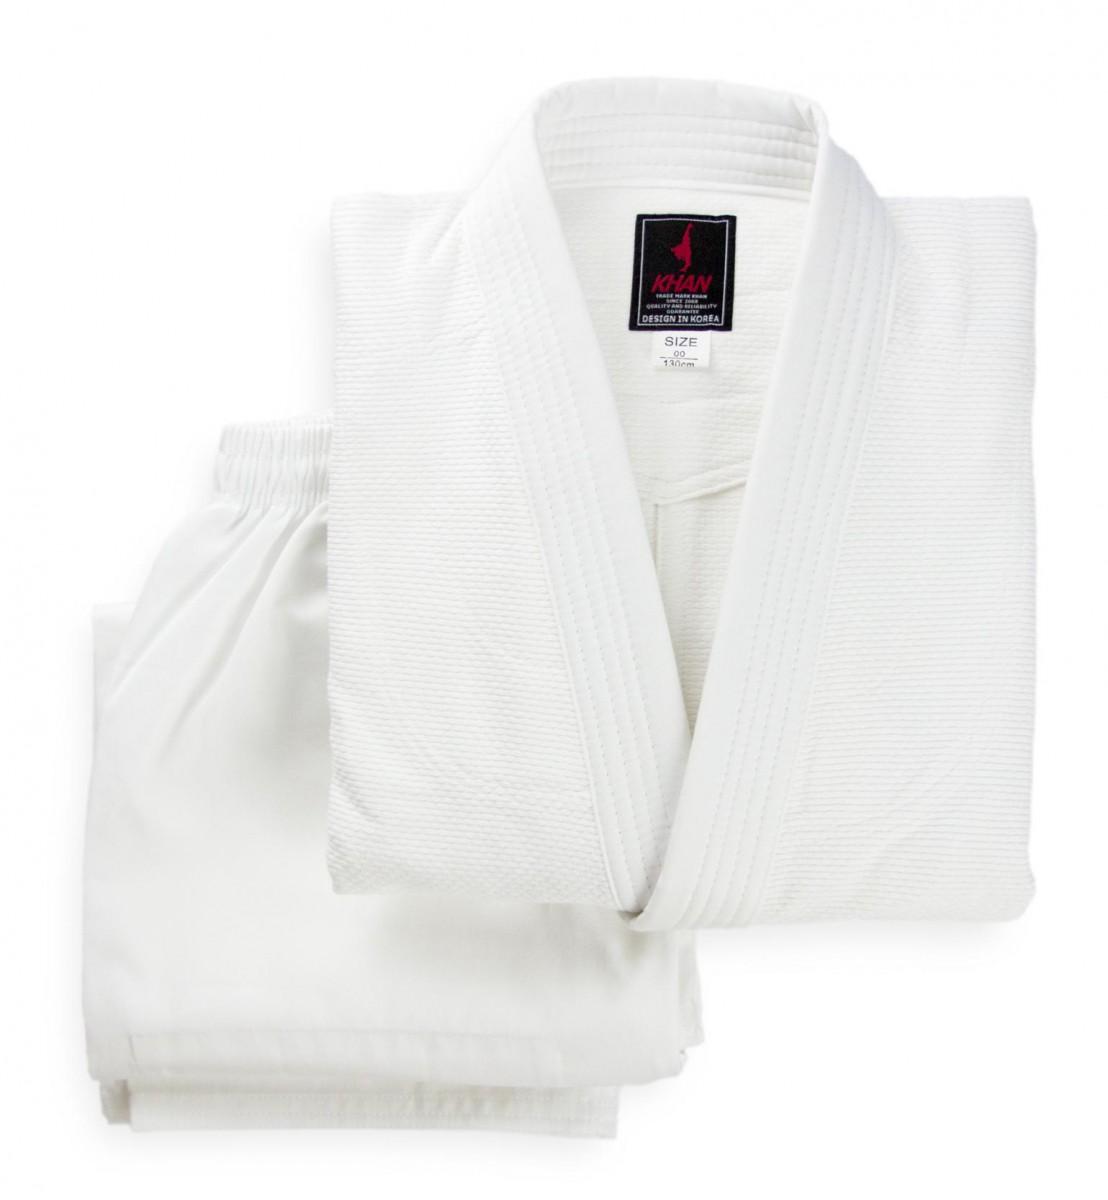 Форма для дзюдо (кимоно) KHAN Club с поясом (350 гр)